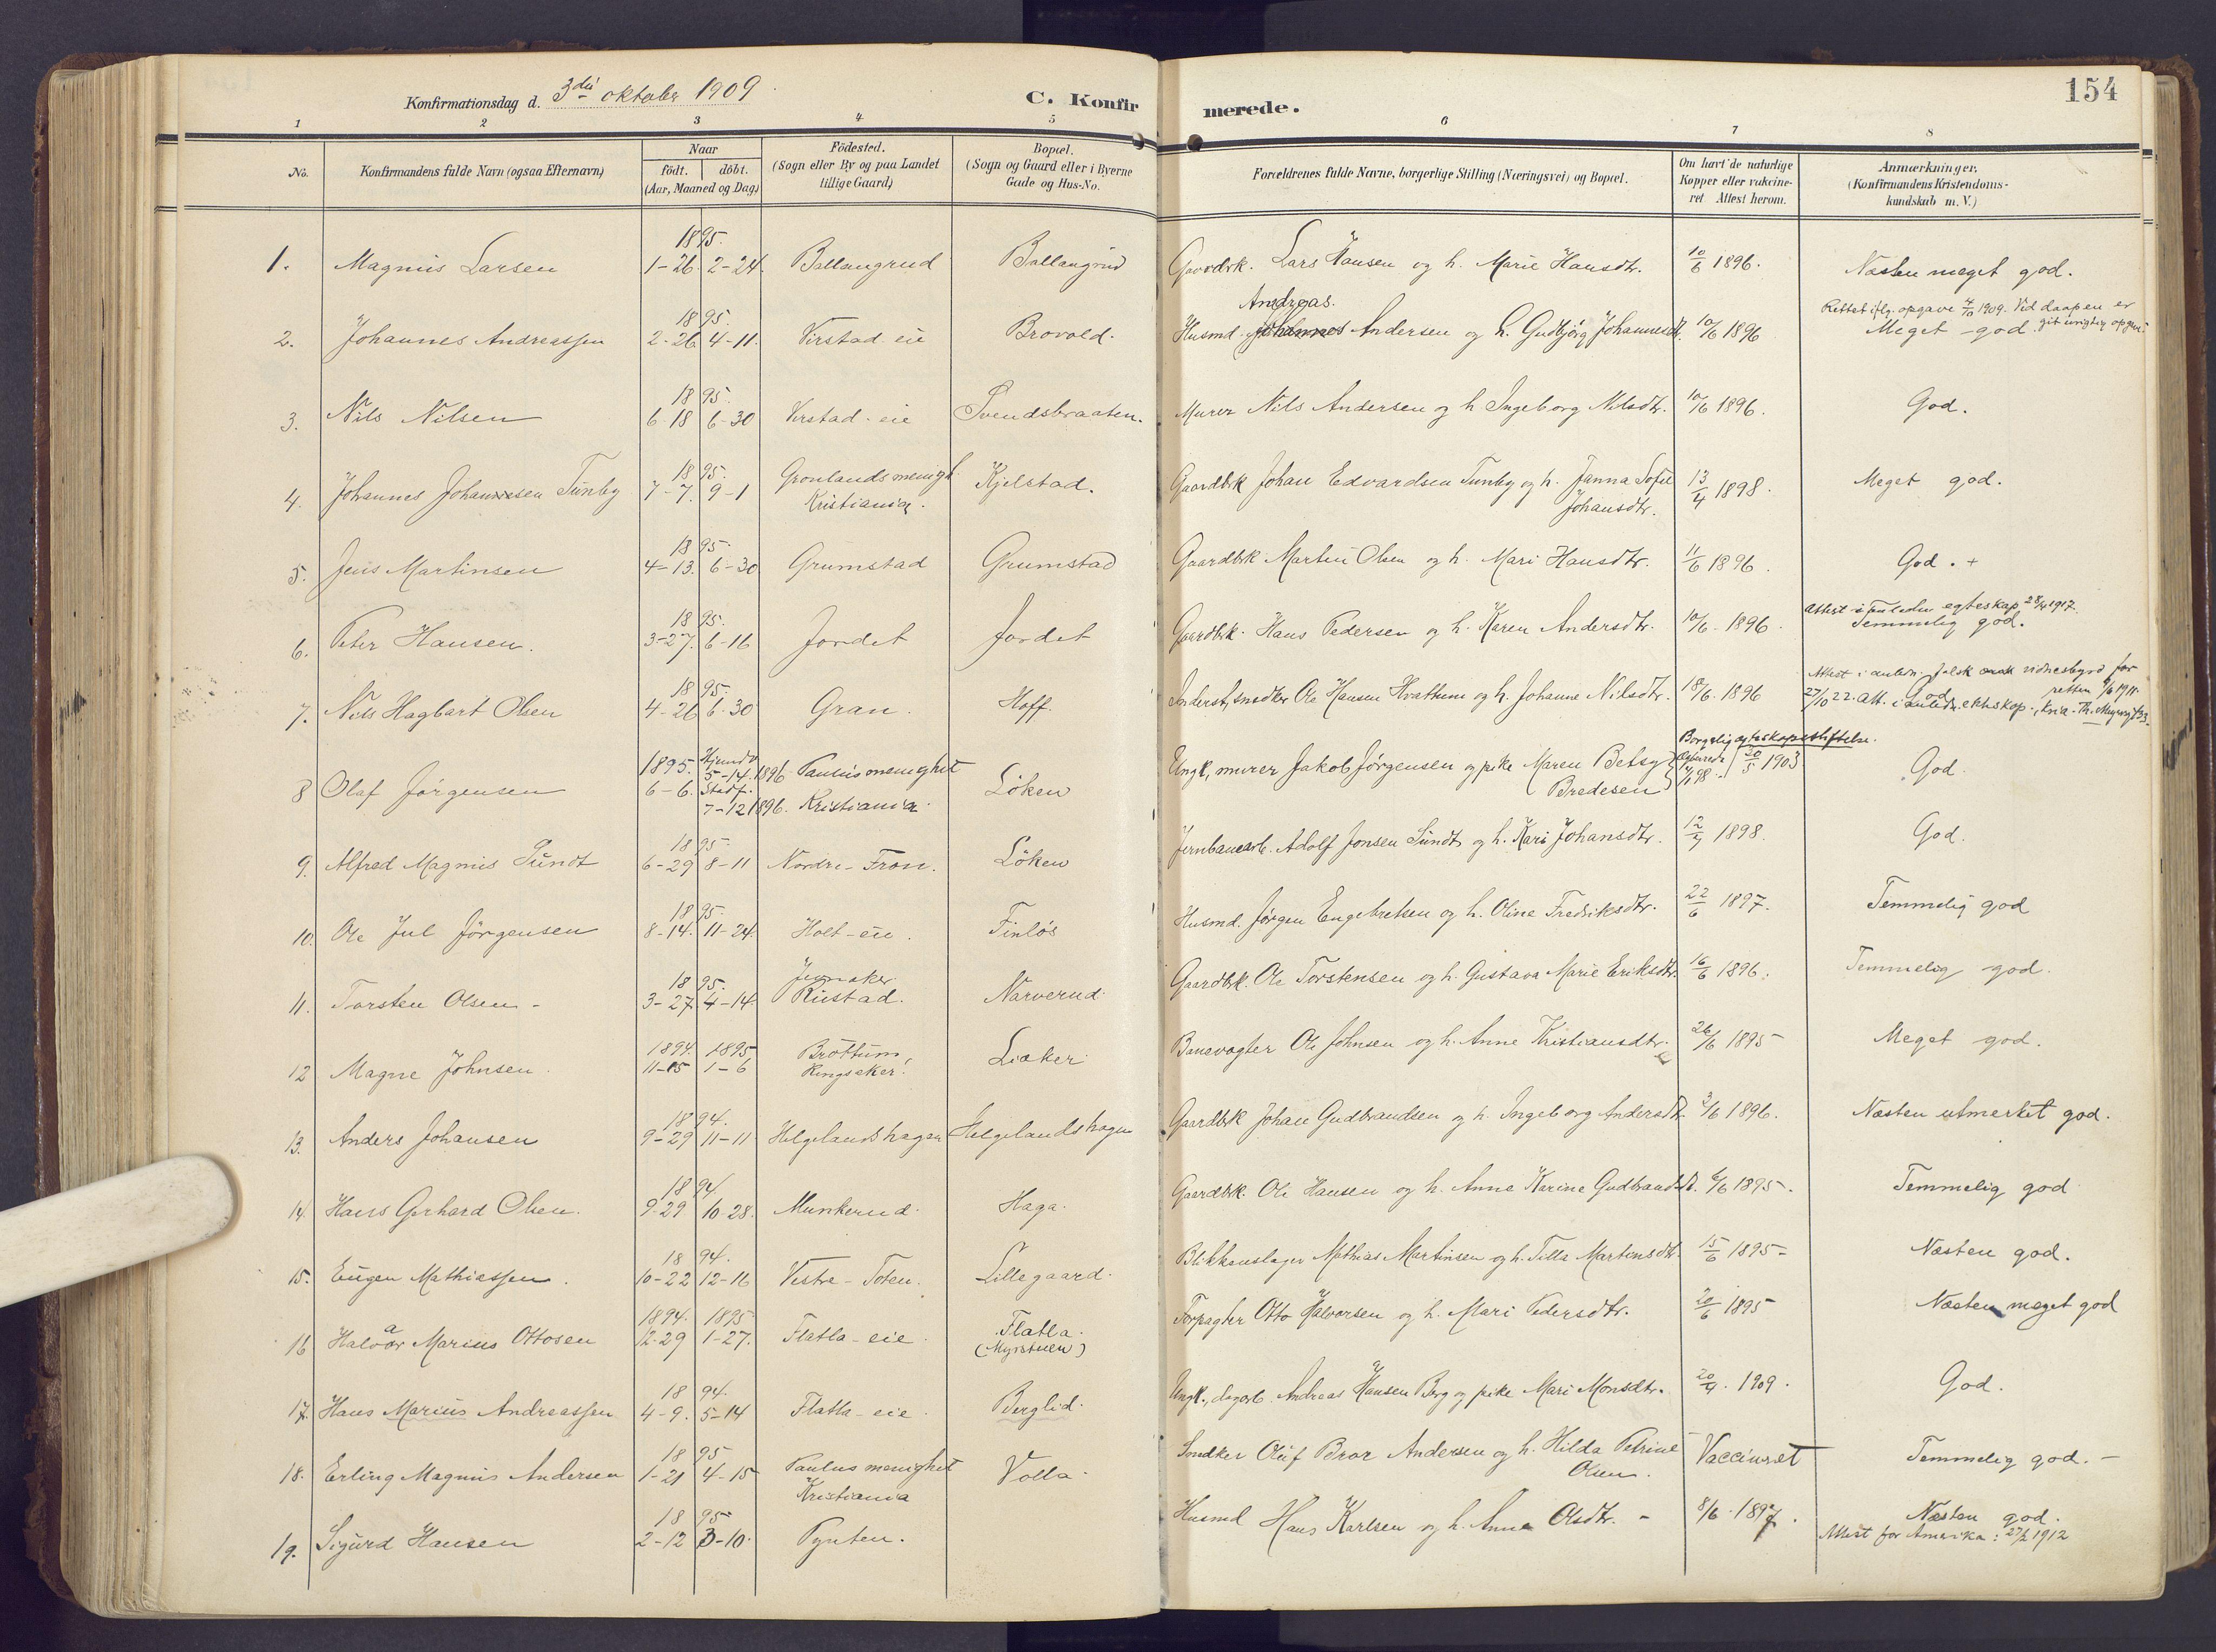 SAH, Lunner prestekontor, H/Ha/Haa/L0001: Ministerialbok nr. 1, 1907-1922, s. 154